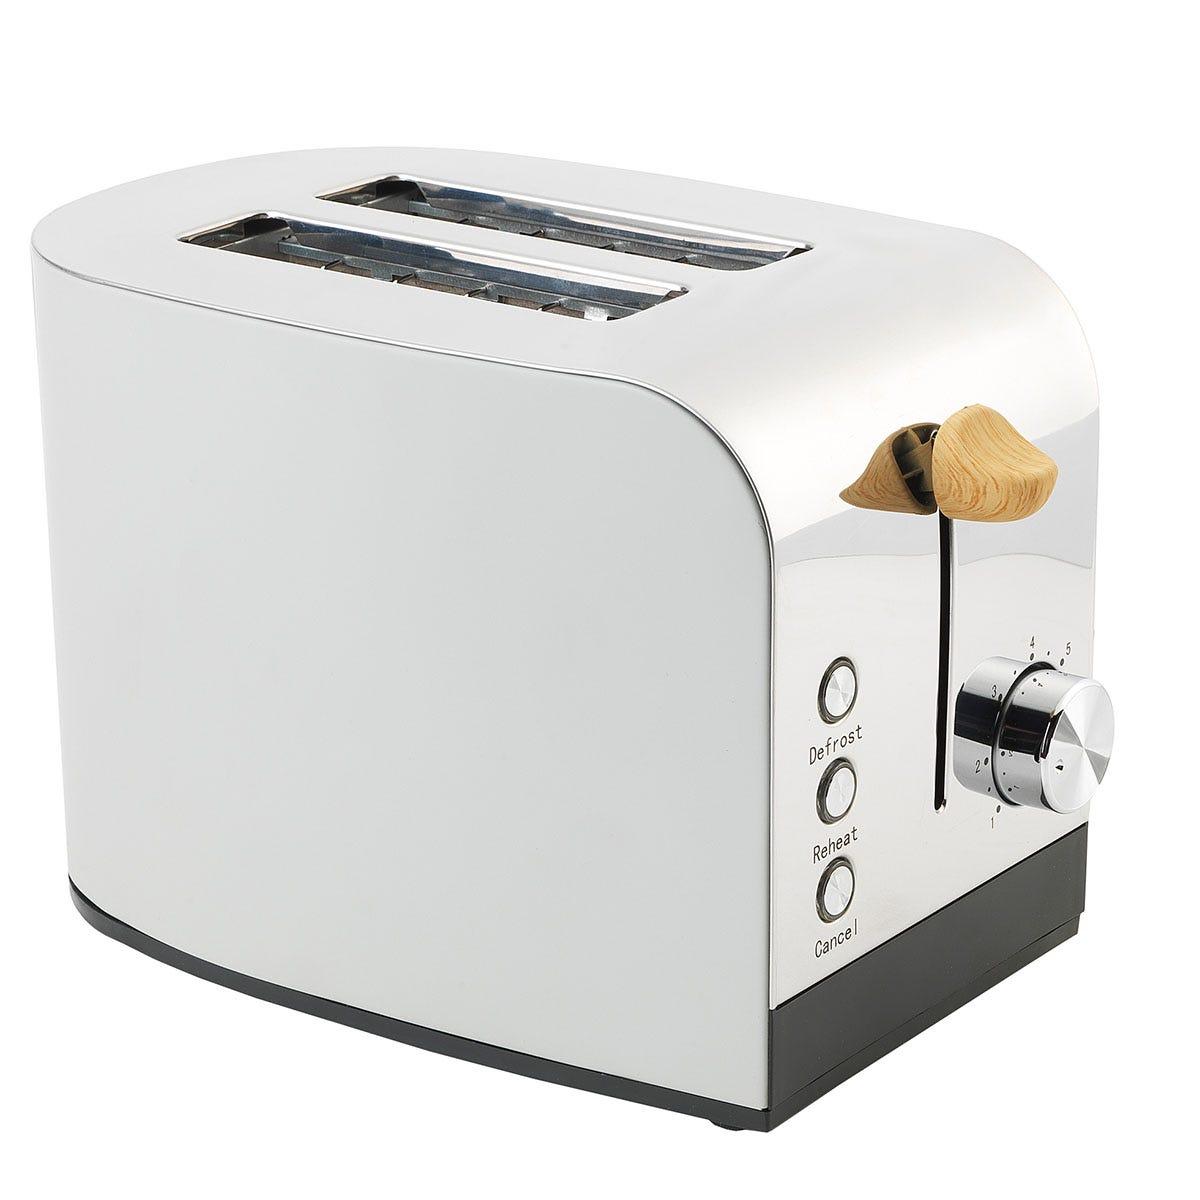 Salter EK3618GRY Skandi 2-Slice Toaster - Grey